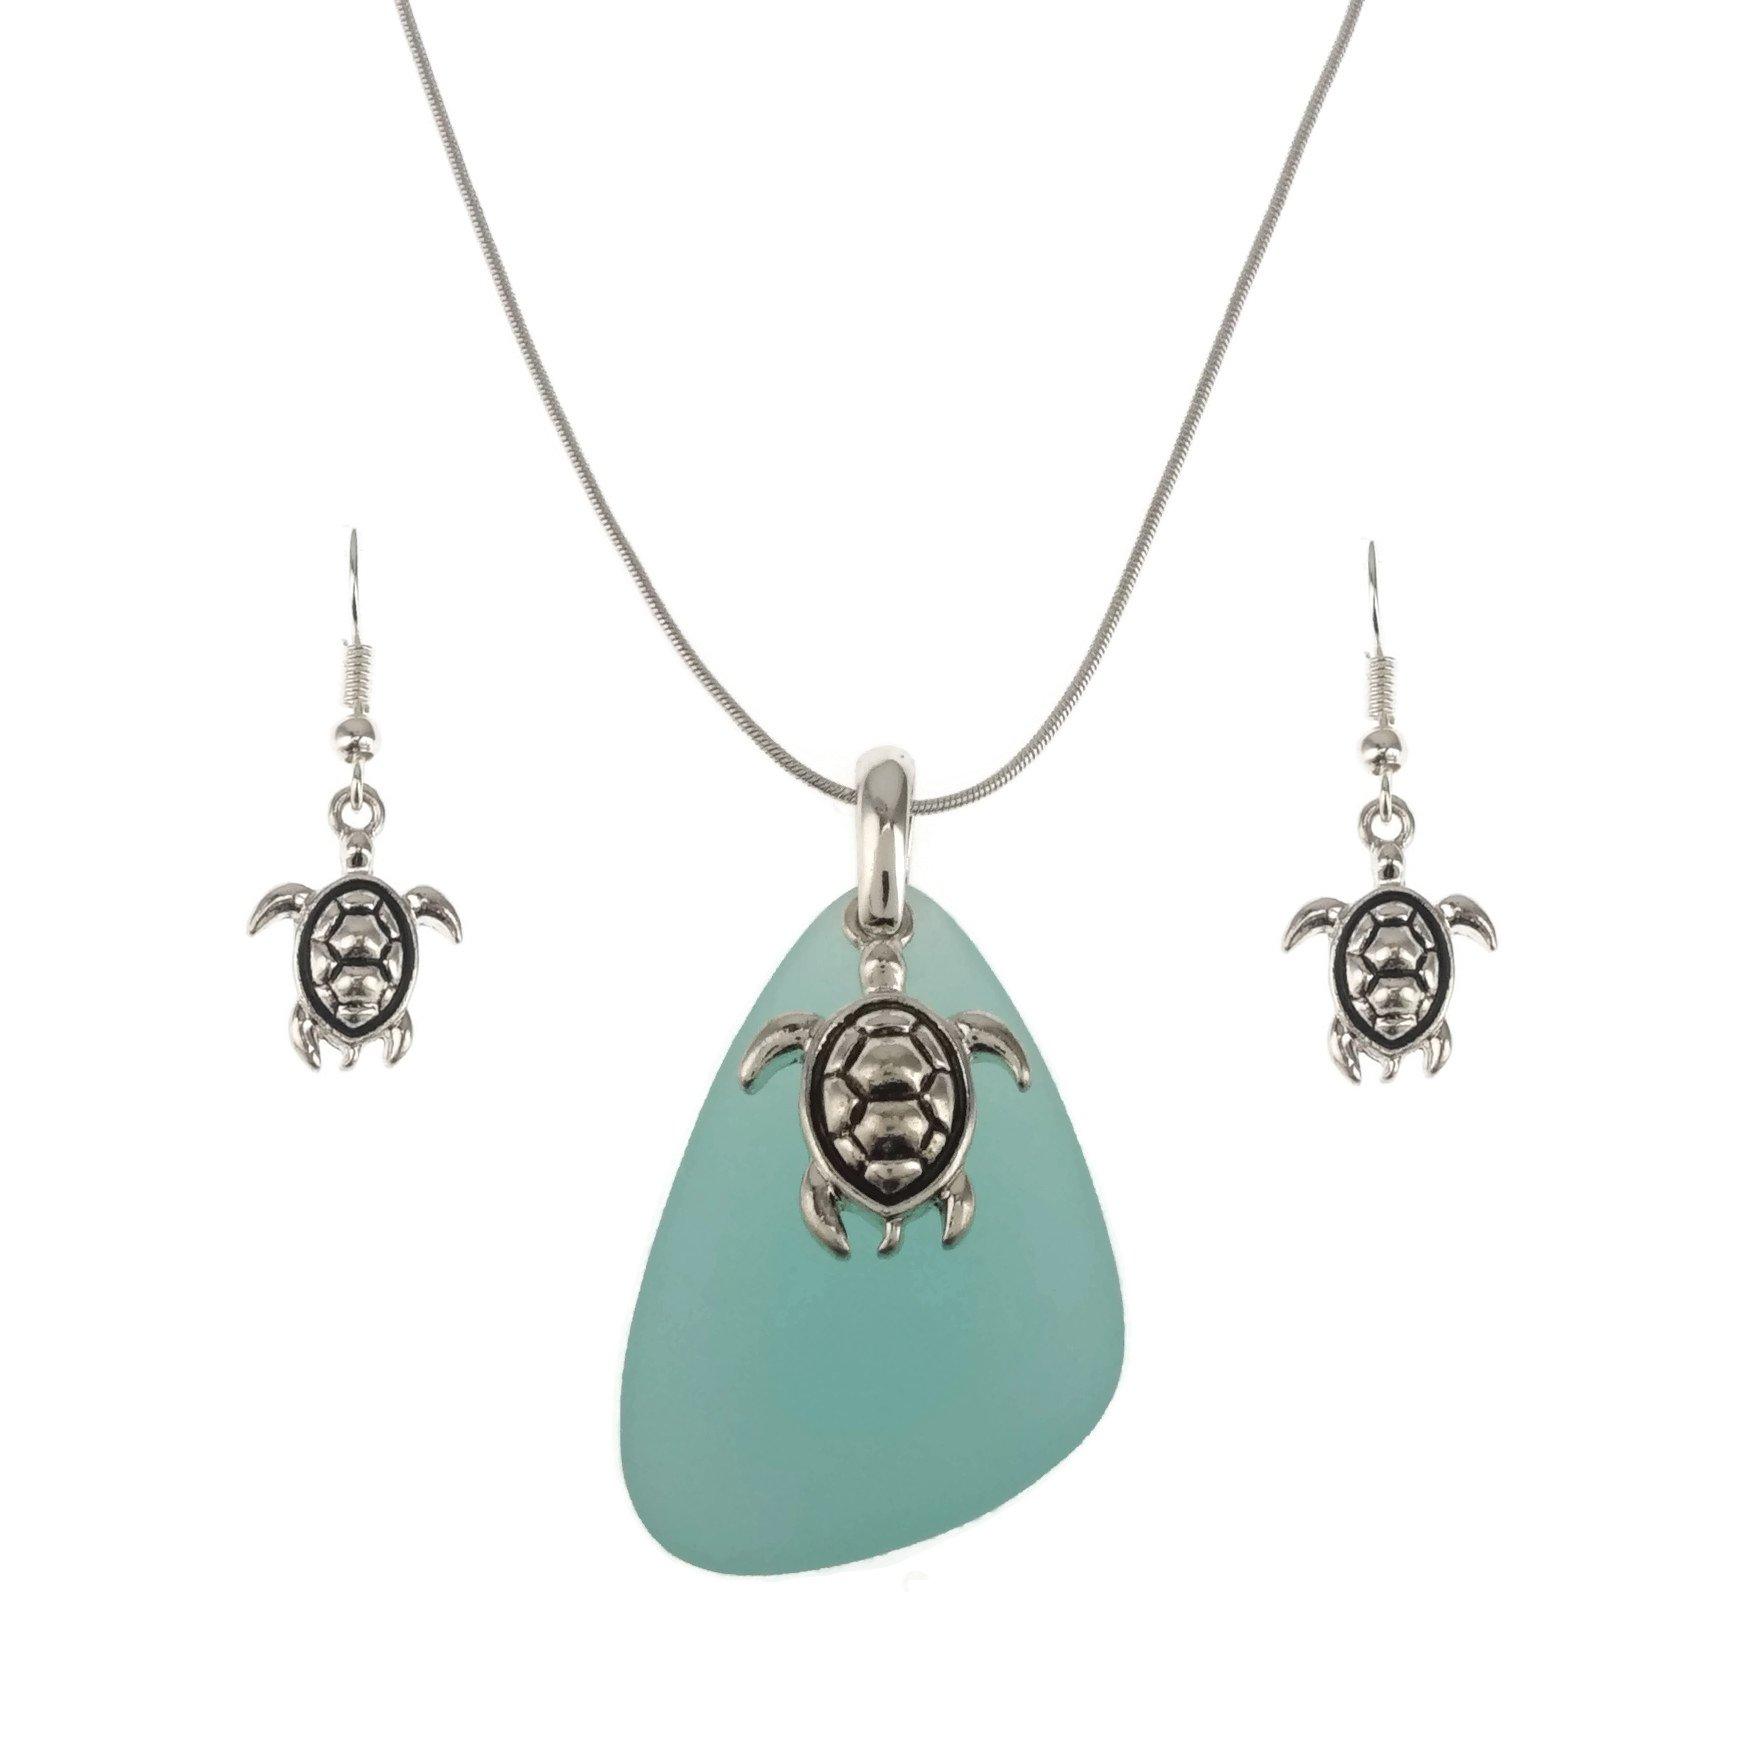 Blue Sea Glass Pendant Long Necklace 27'' and Earrings Set (Turtle - Aqua)